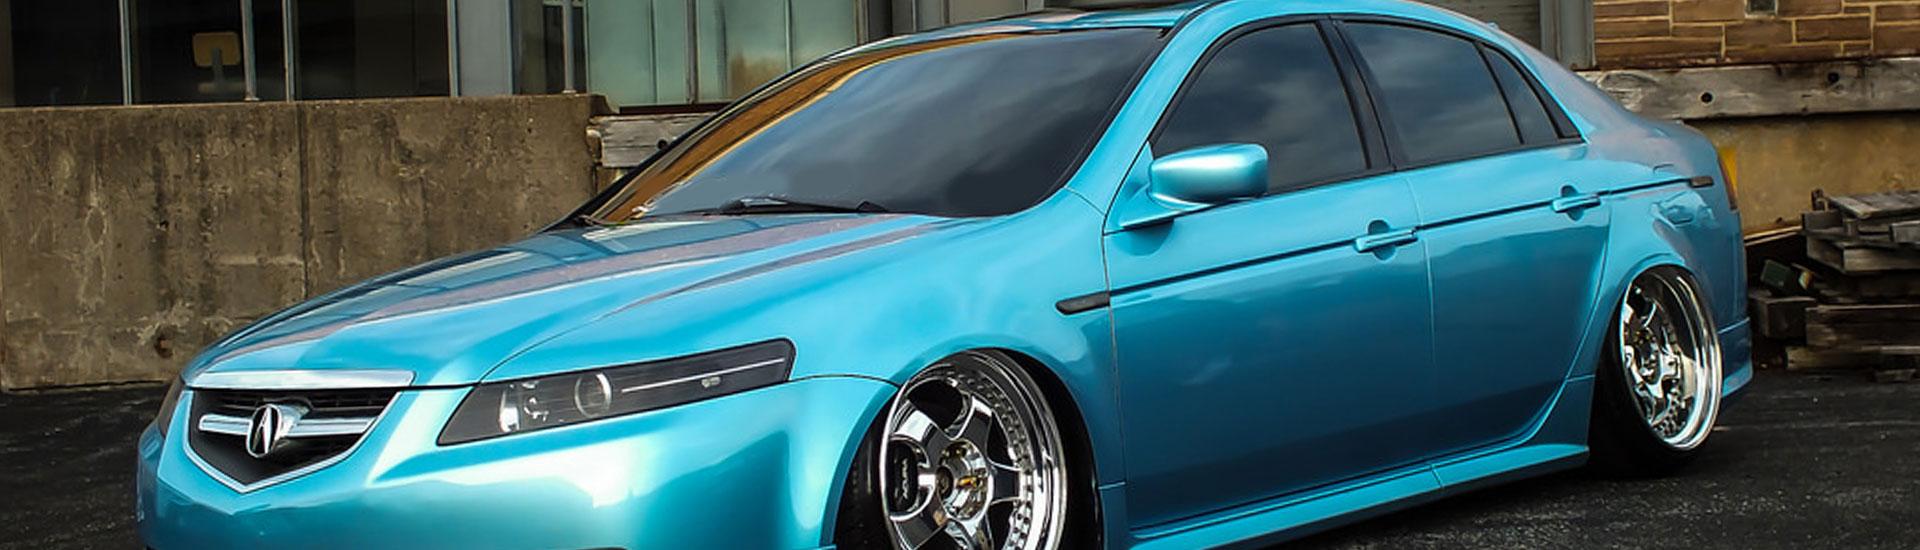 Acura Accessories Tints Rvinylcom - Acura tl upgrades